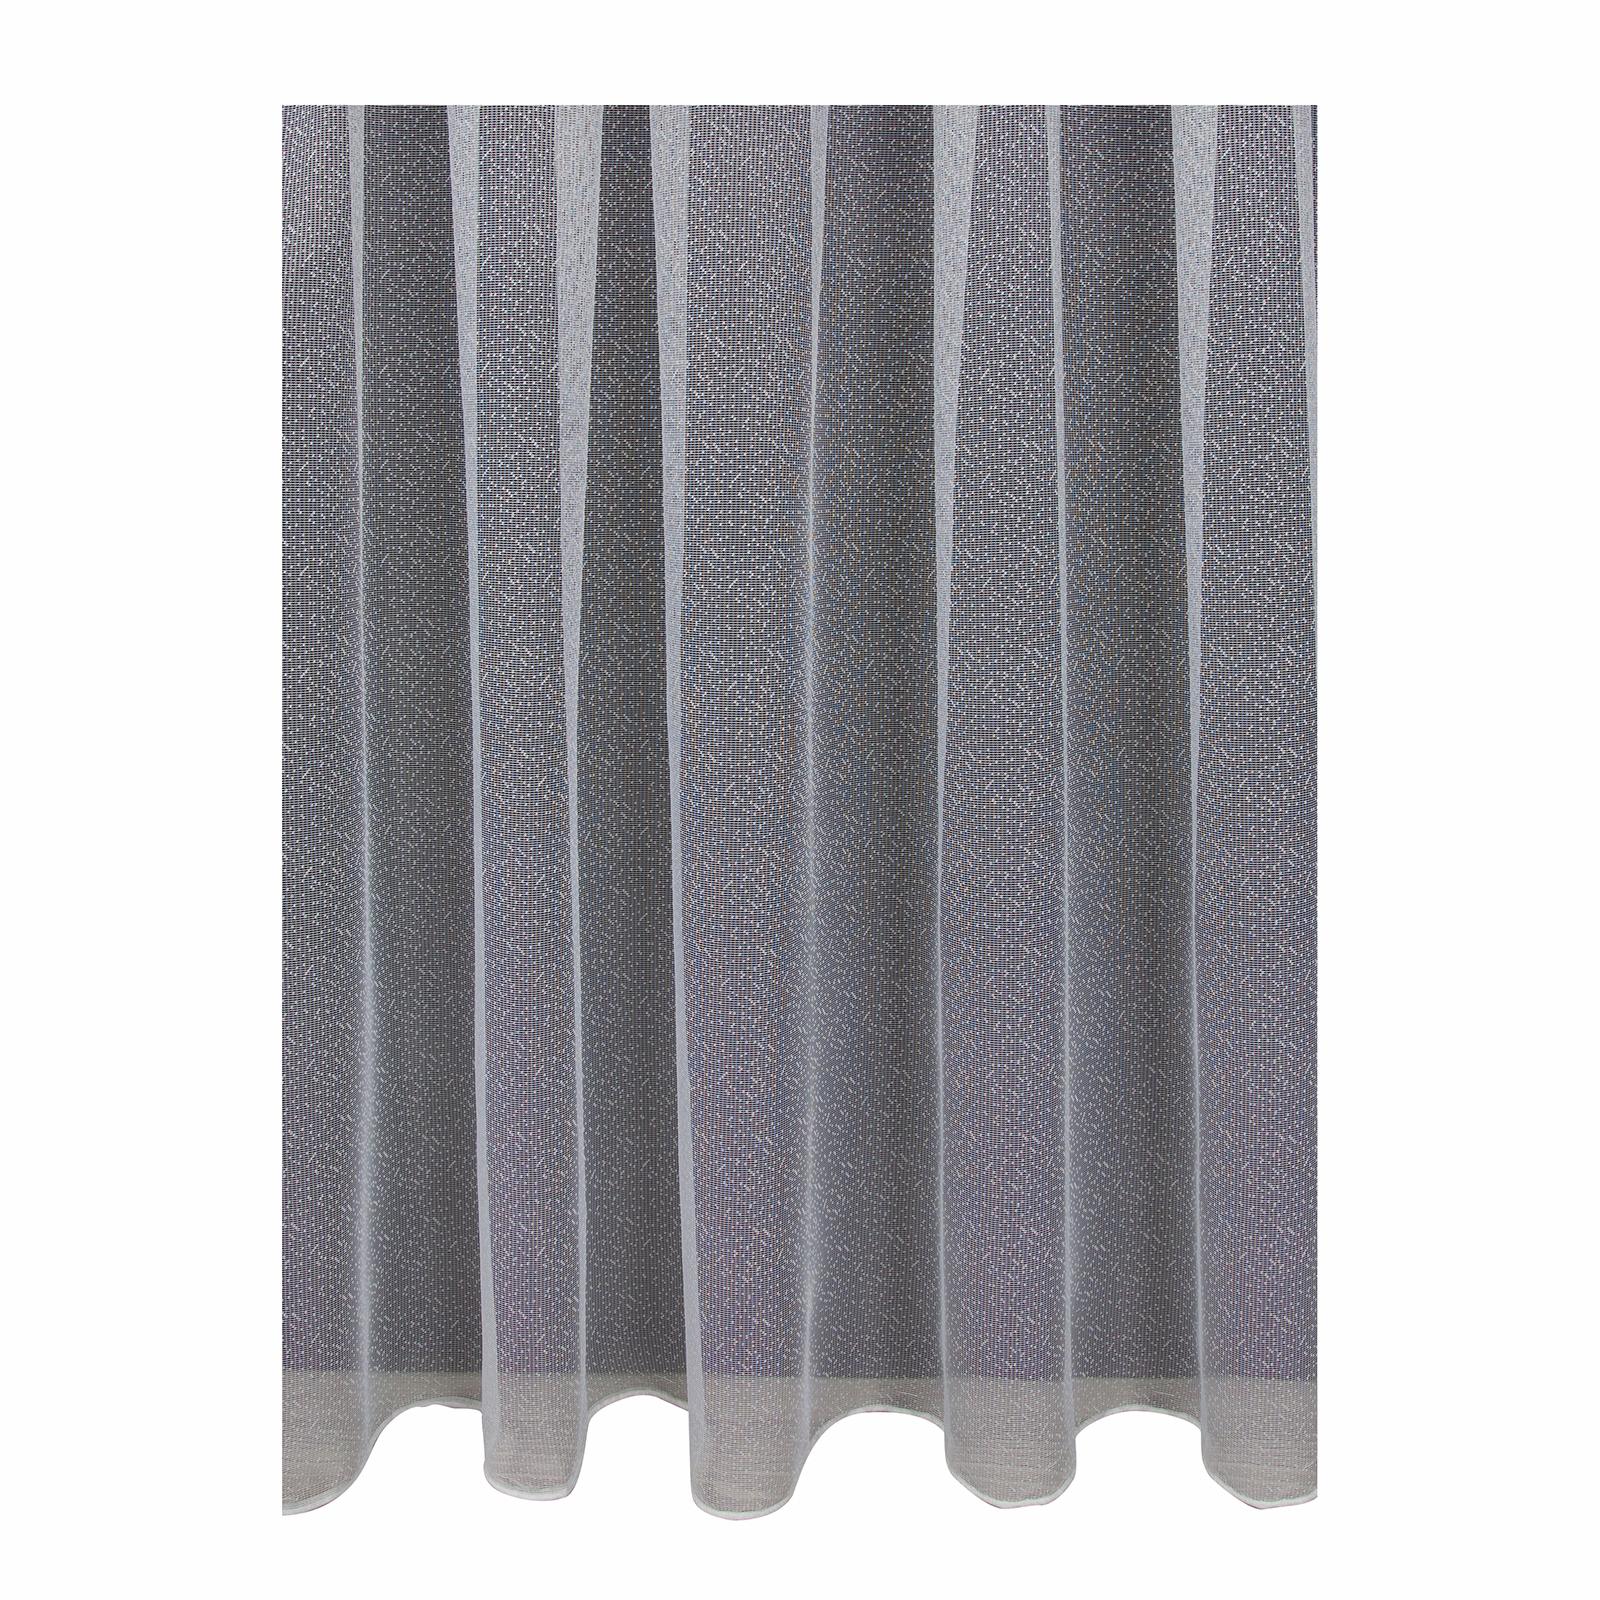 Homebase 1.5 - 2.3 x 2.13m Shadowline Sheer Curtain